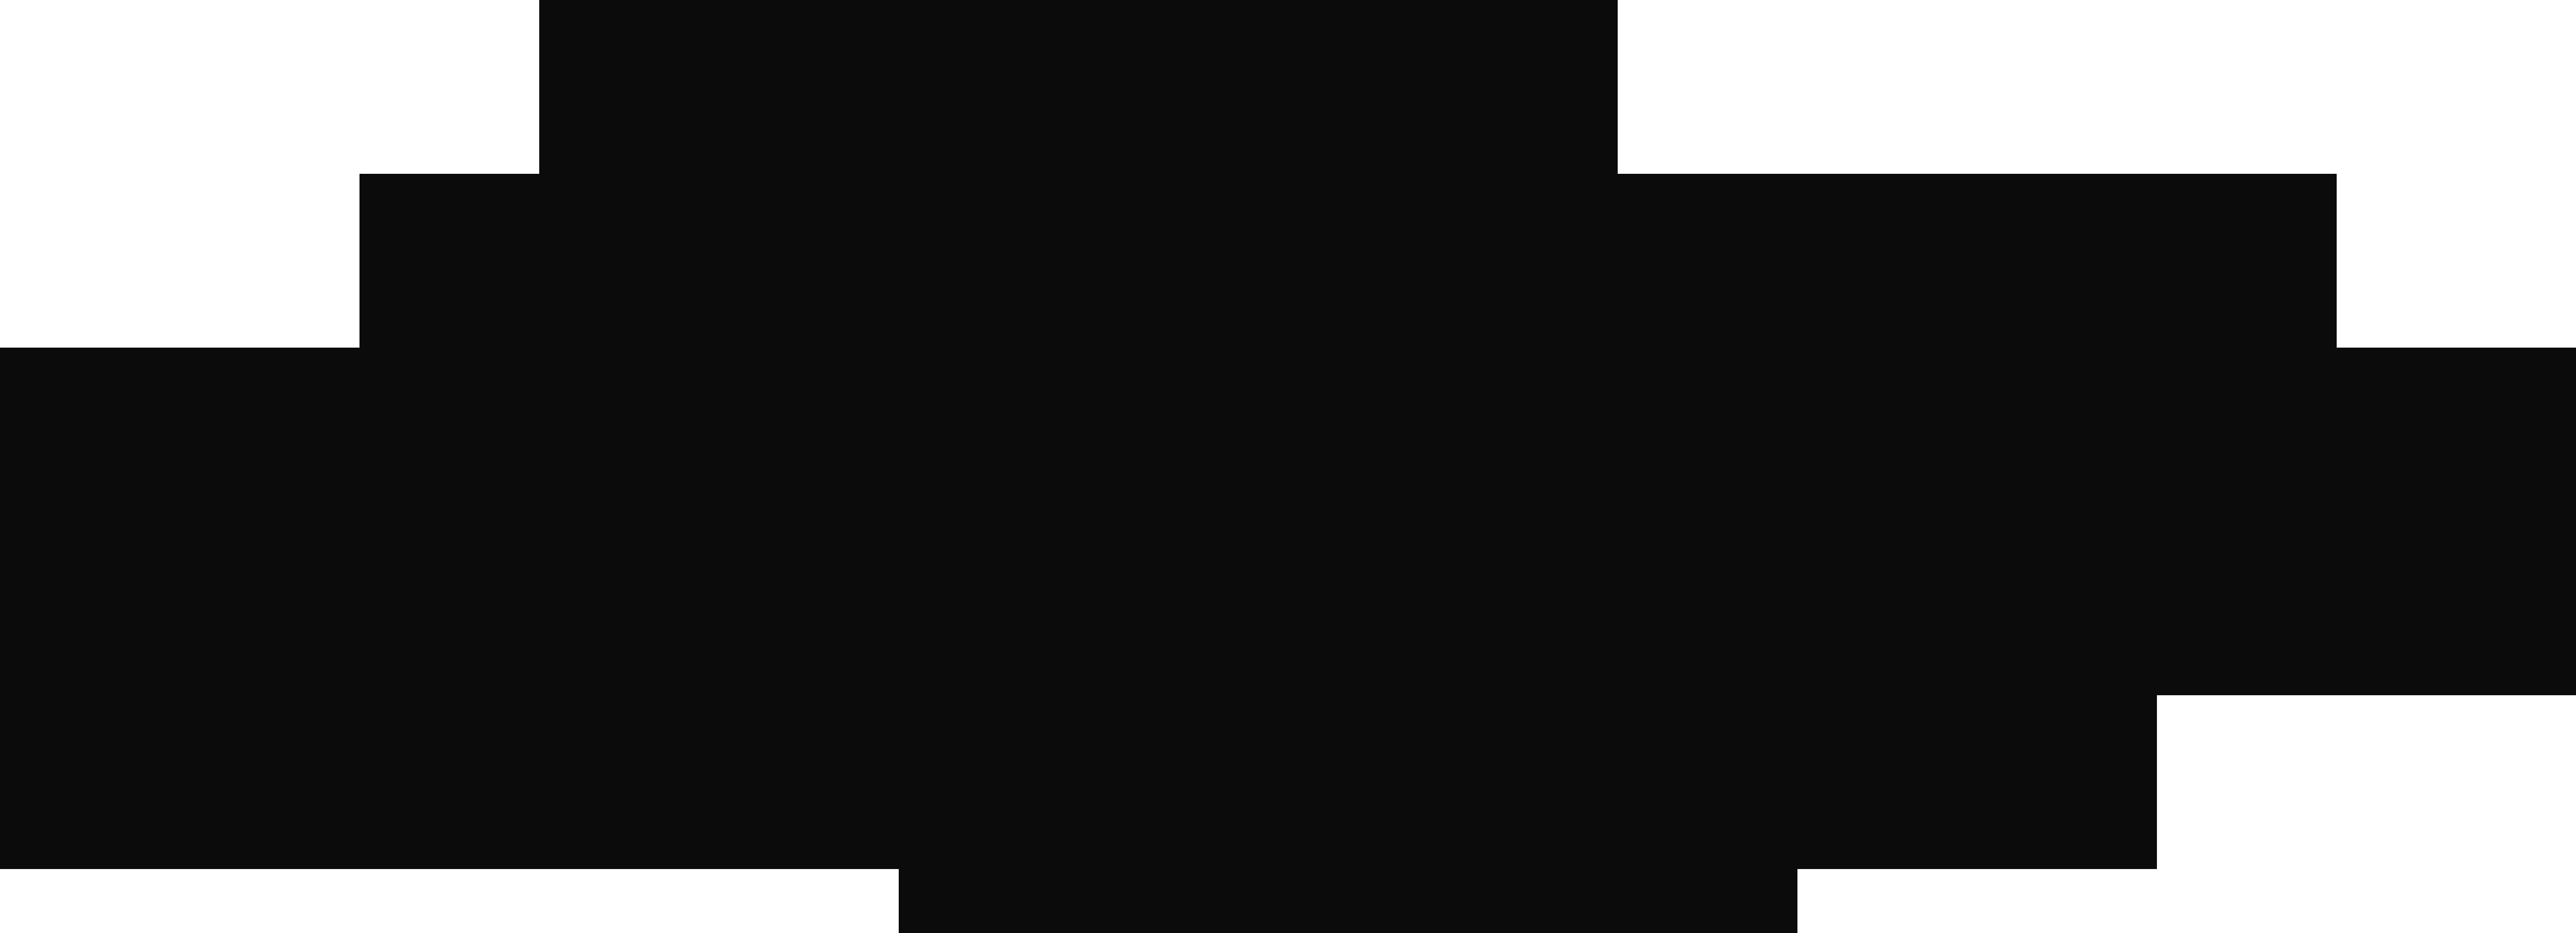 CLI_Texture_Gray-1